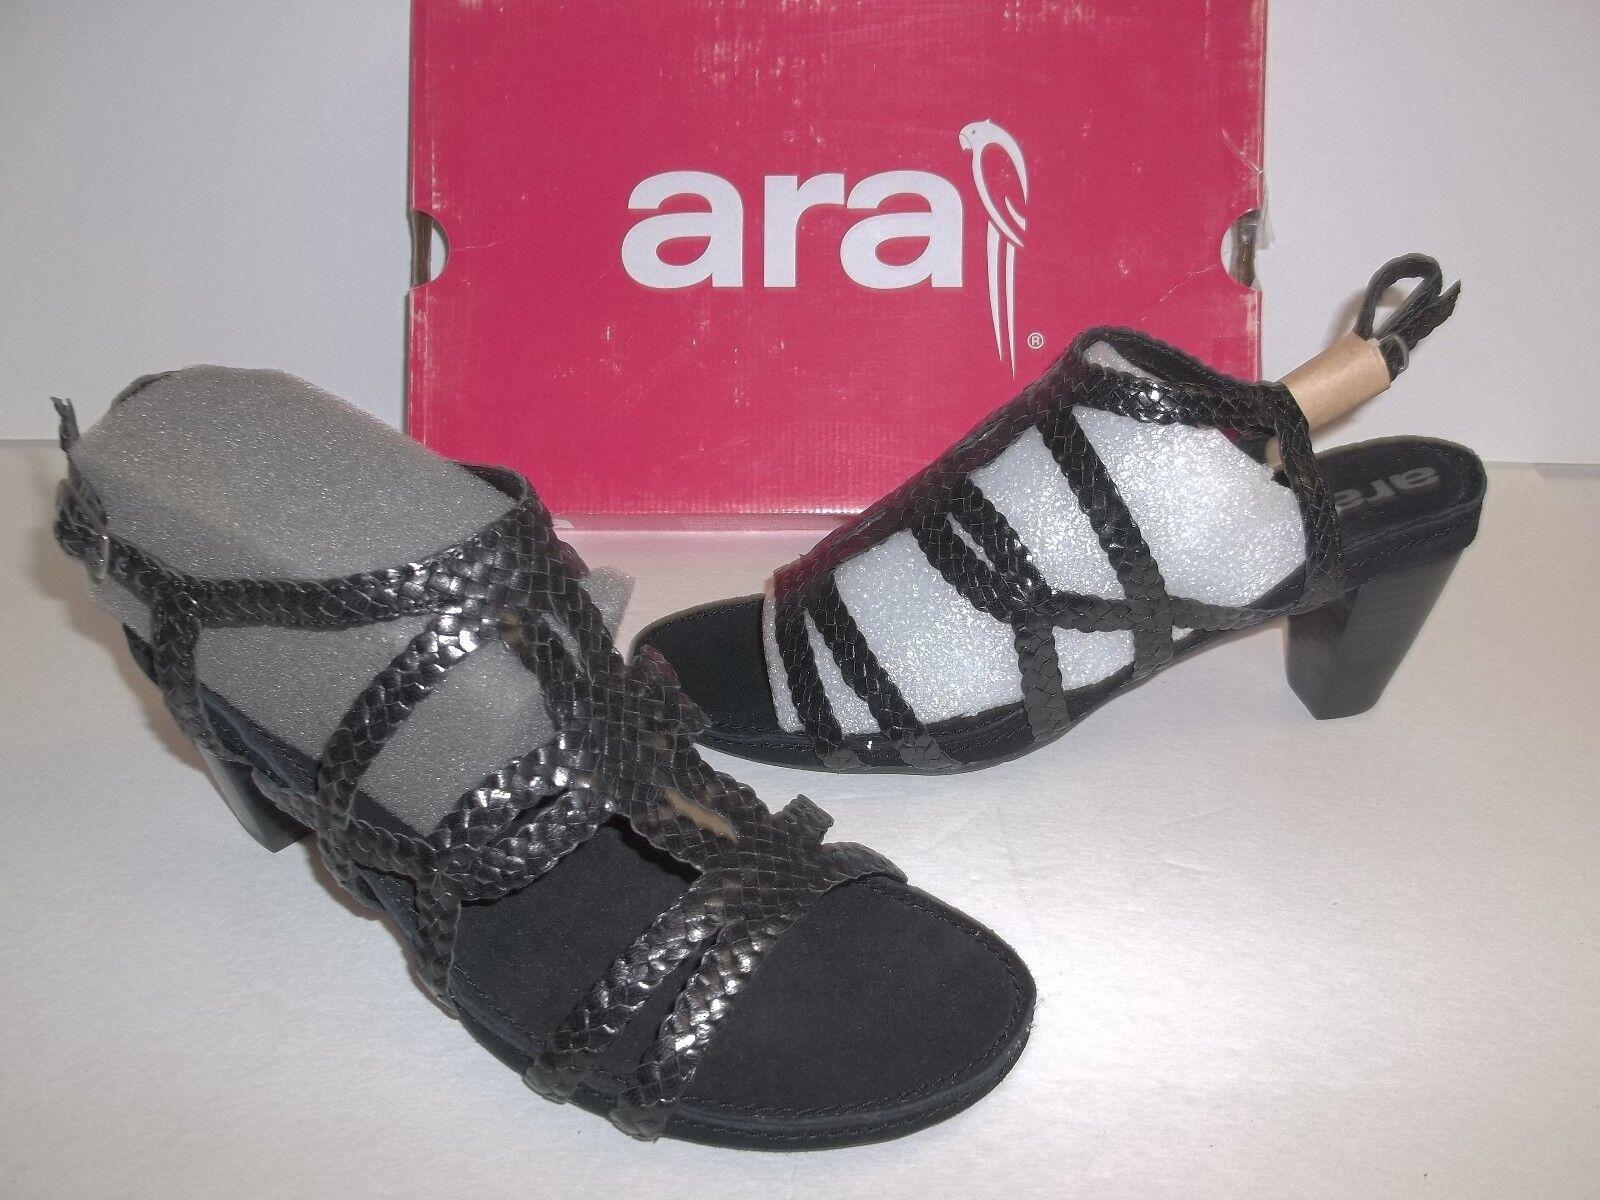 Ara Size 9 M Raven Black Woven Leather Leather Leather Sandal New Womens shoes 82ec2e